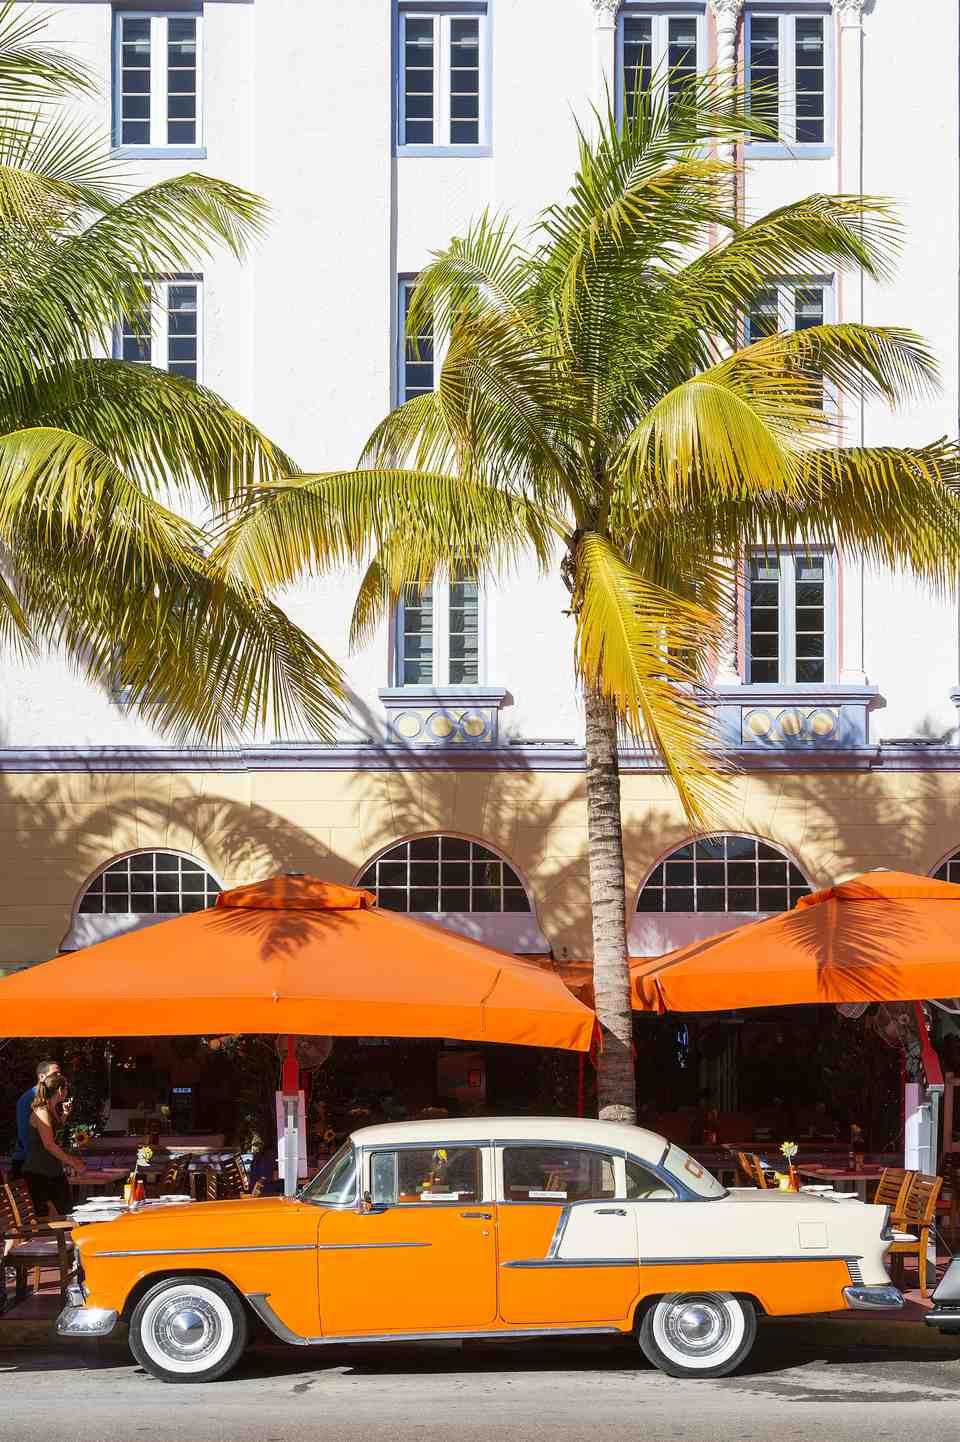 Vintage car in South Beach, Miami